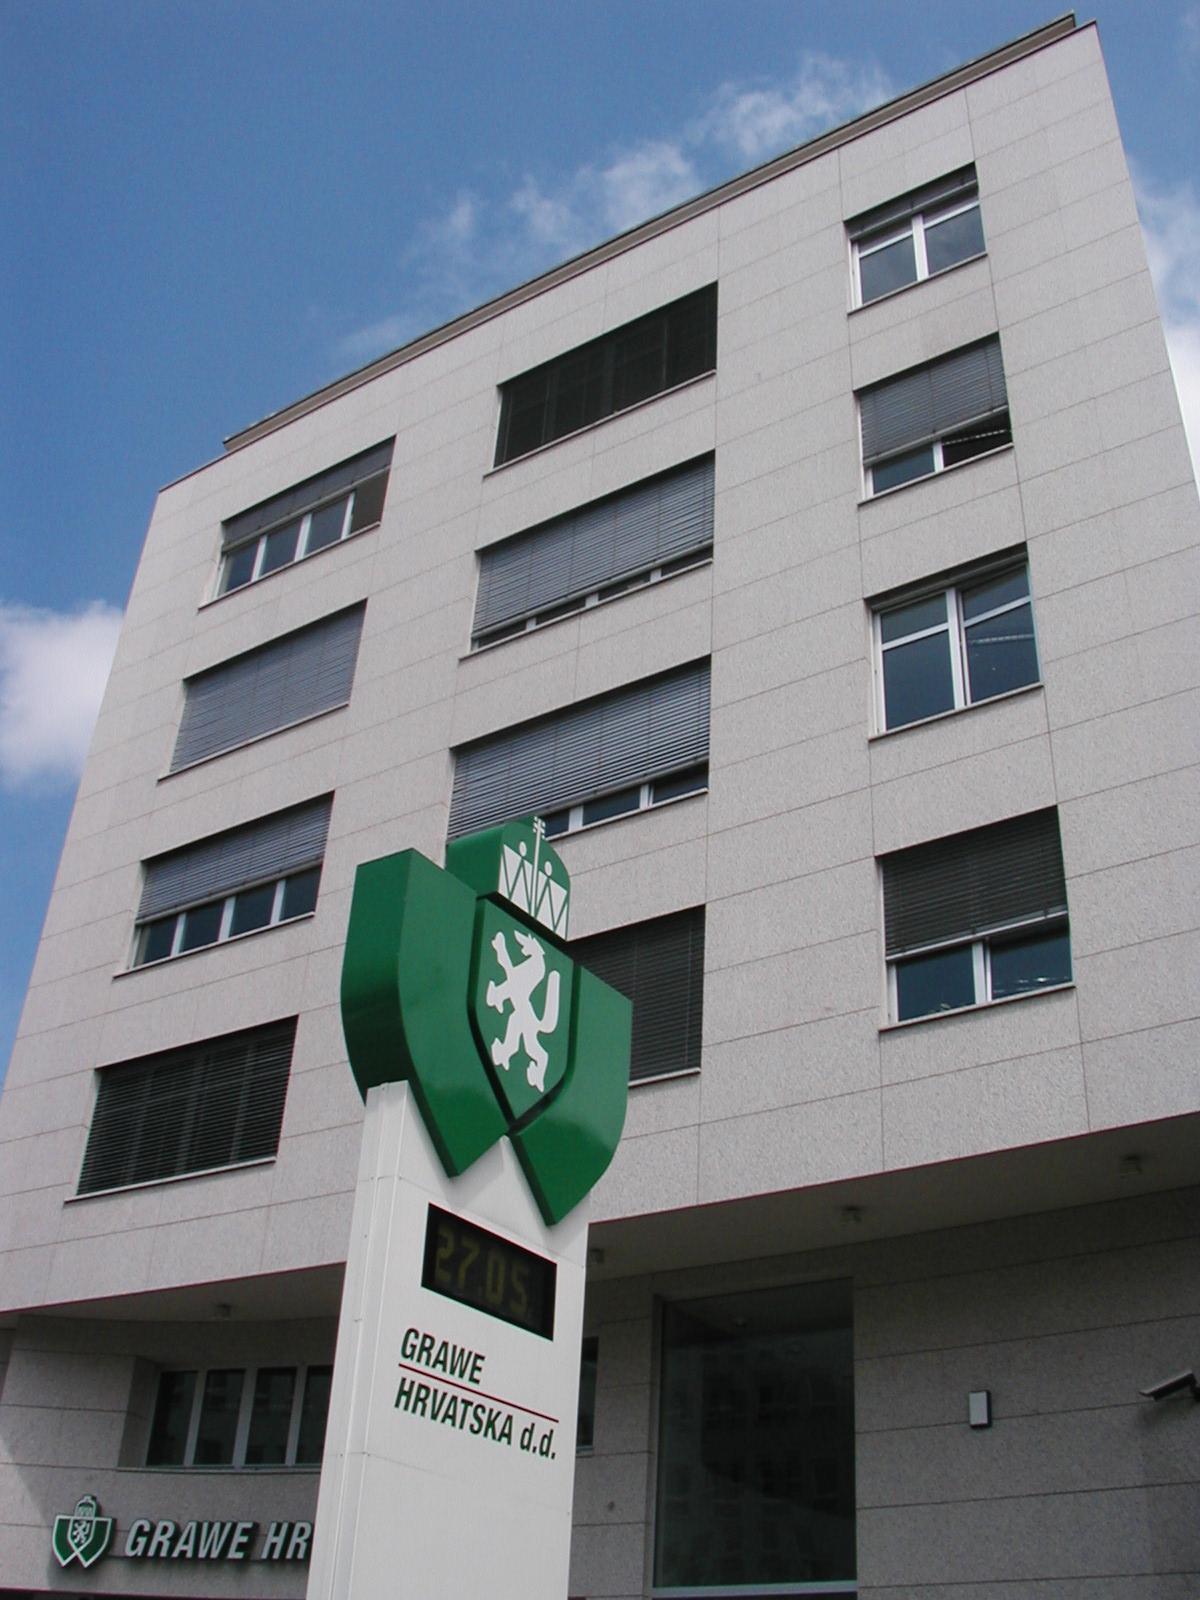 GRAWE Hrvatska d.d. generalna direkcija u Zagrebu